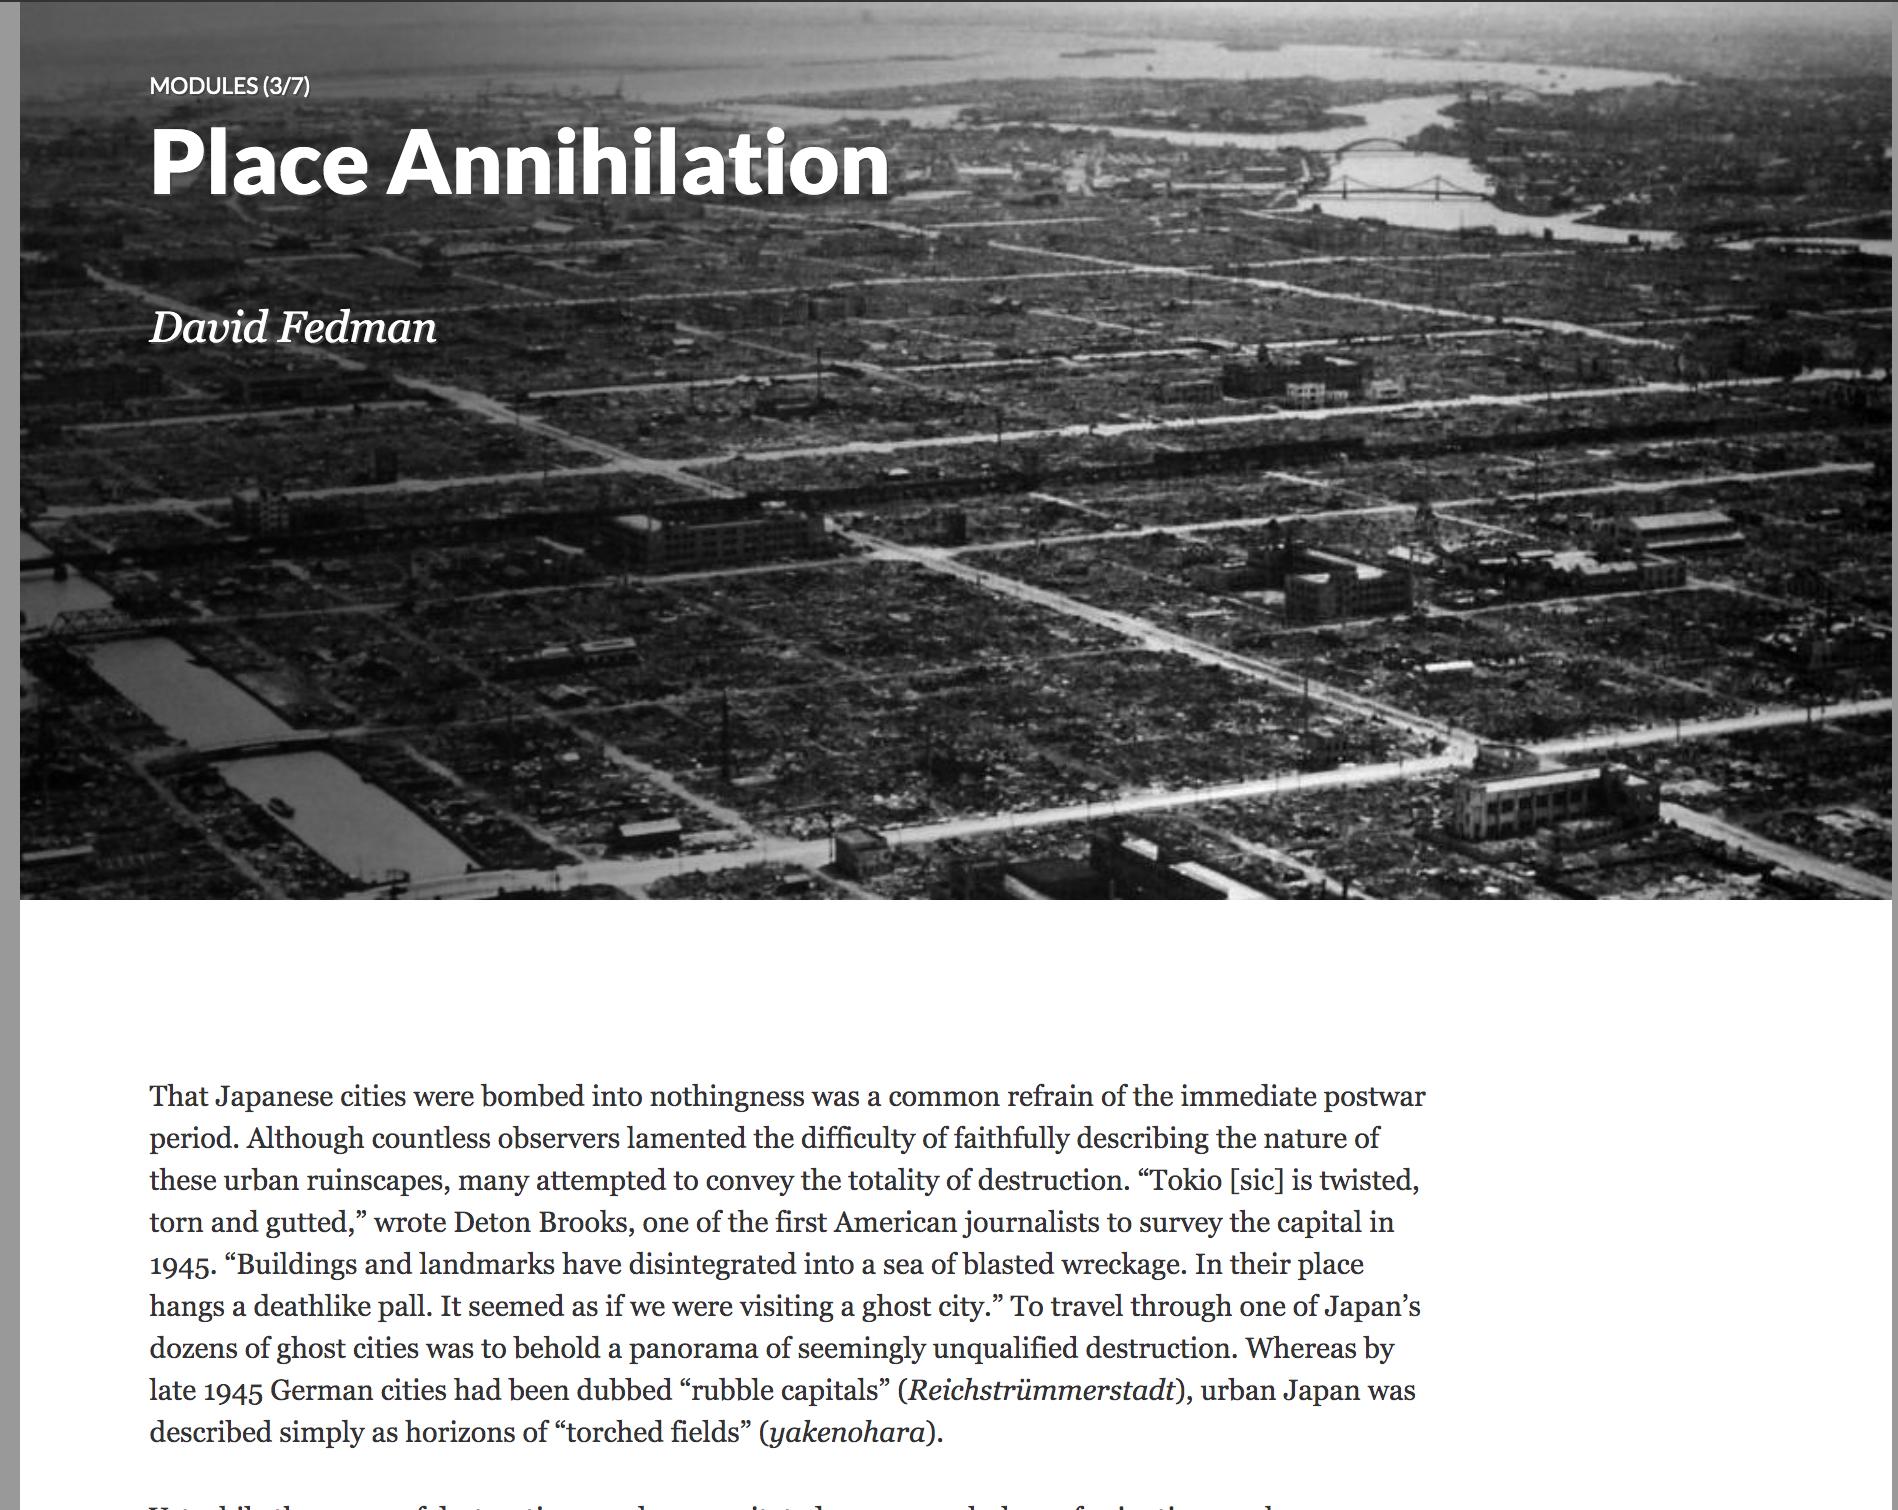 "Figure 2. The landing page for David Fedman's module ""Place Annihilation."" Credit: David Fedman."